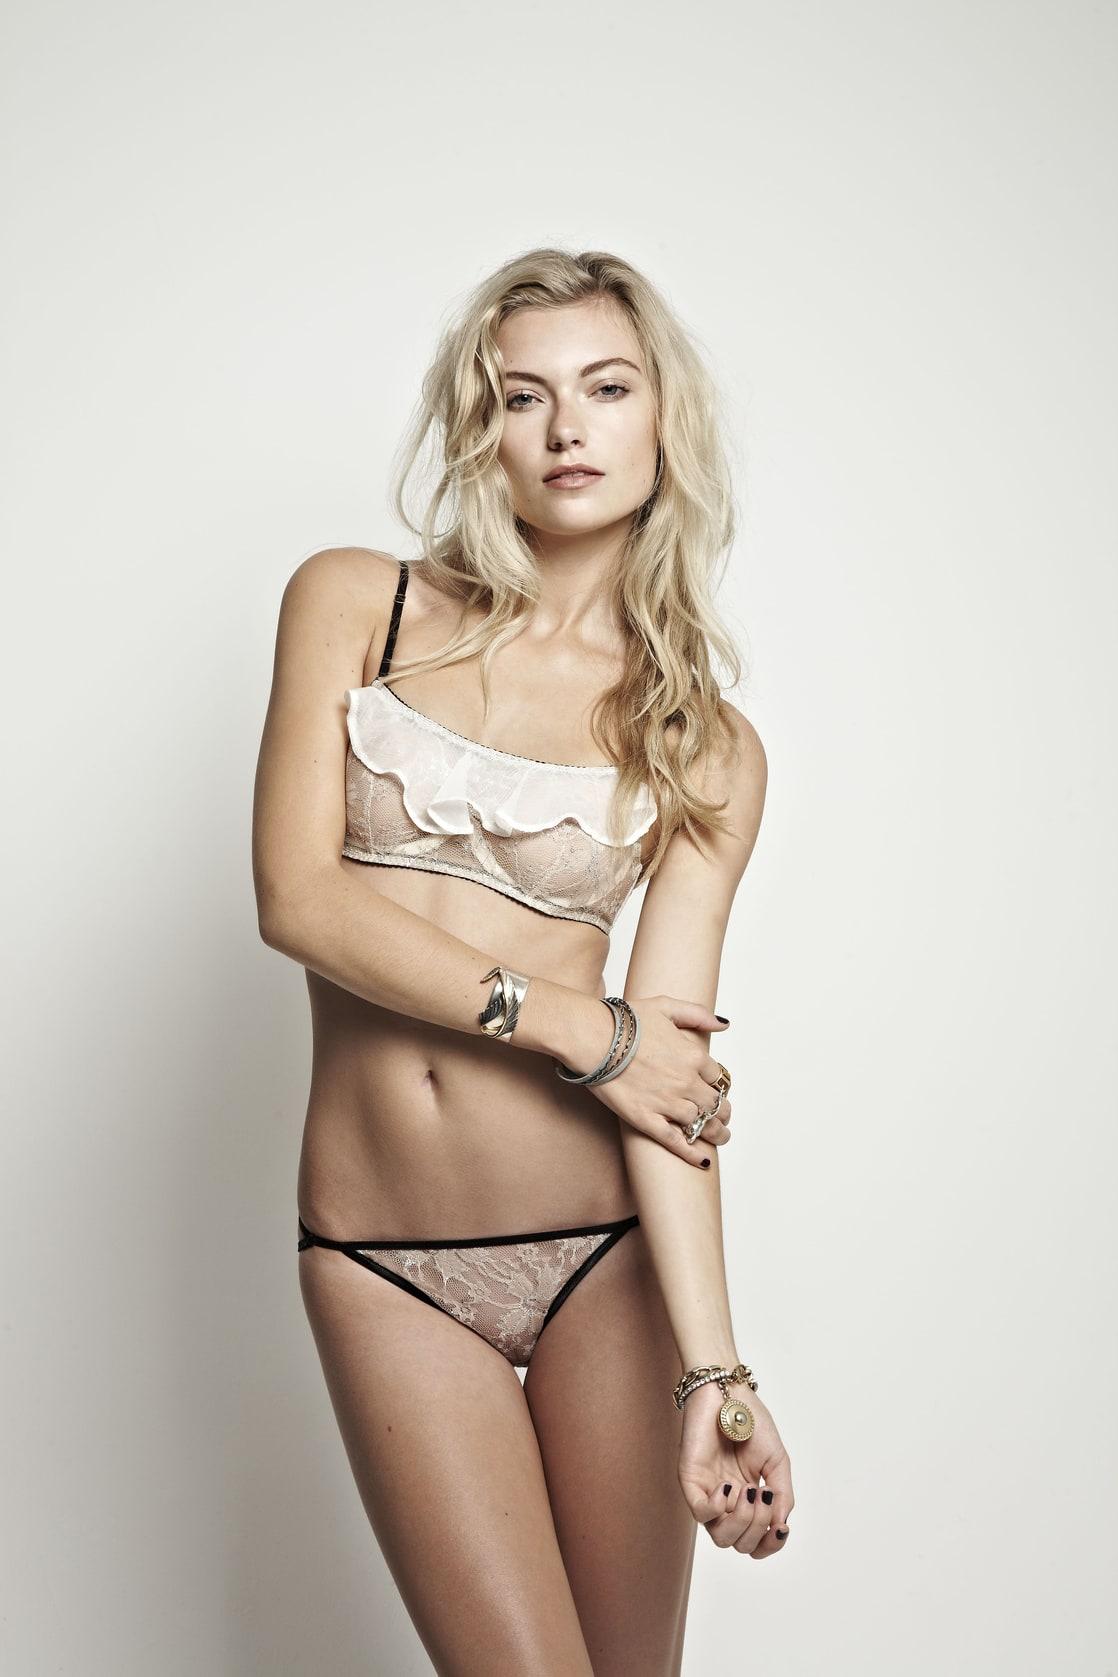 Hot Farah Holt nudes (54 photos), Tits, Bikini, Boobs, bra 2020